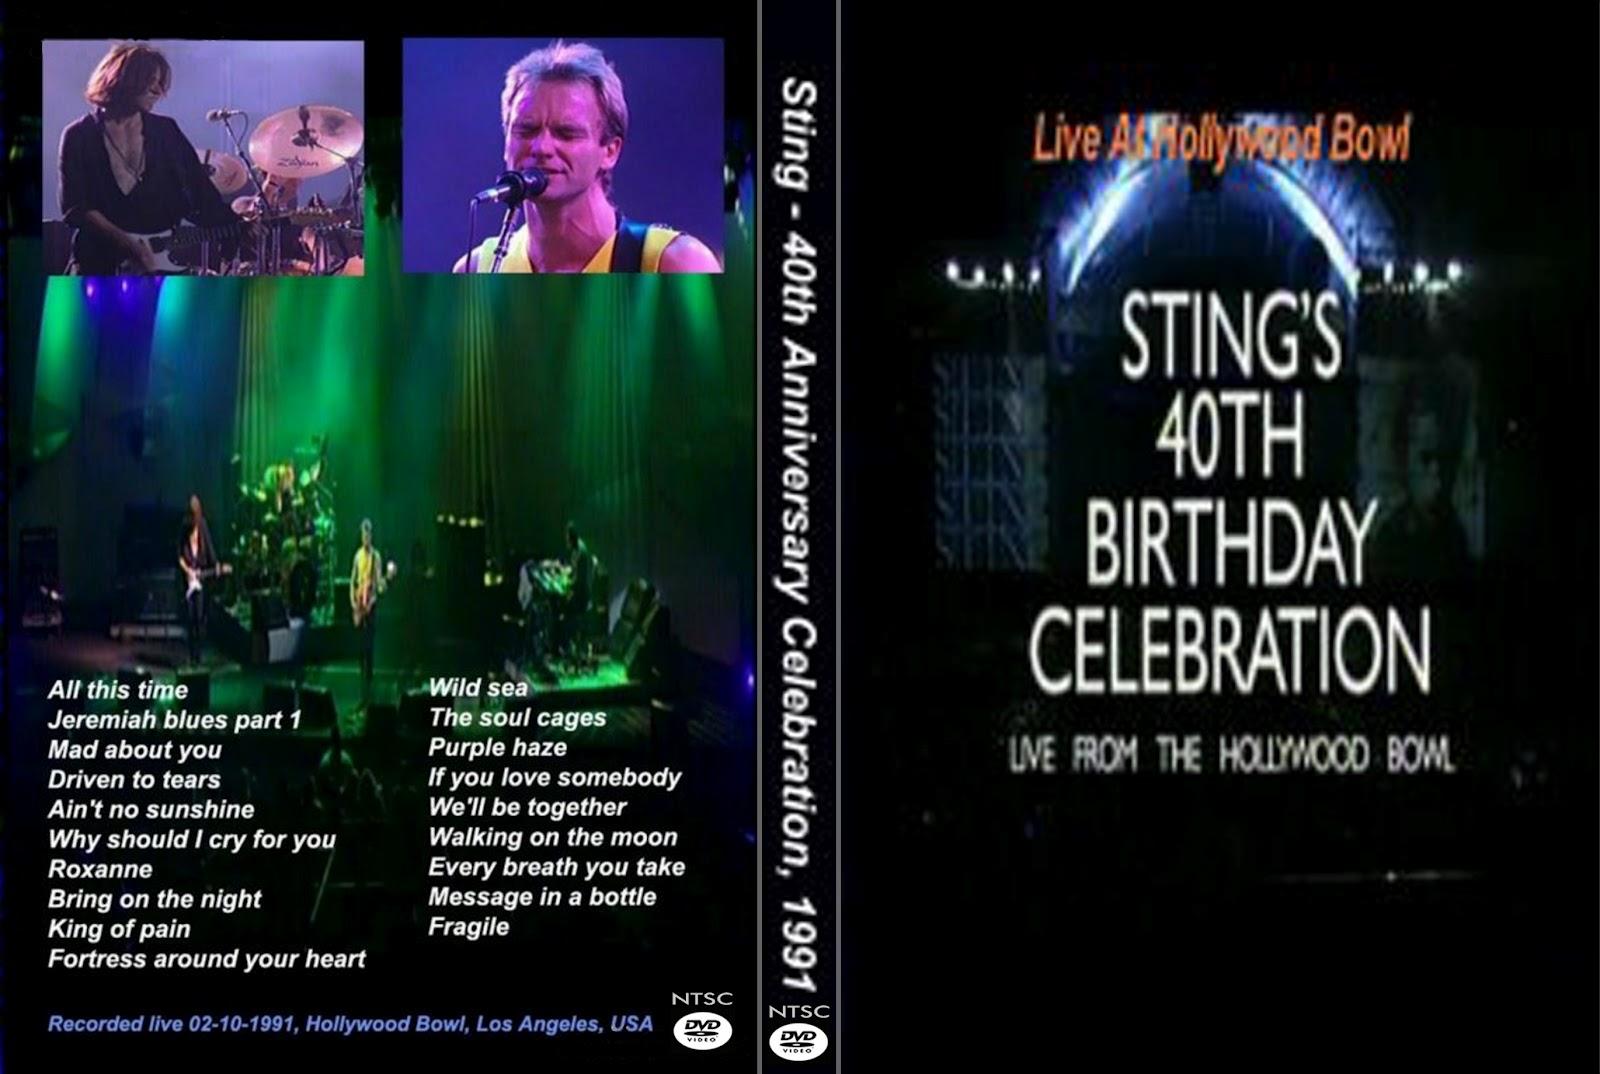 http://3.bp.blogspot.com/-QCfKG86XldI/UEiLVD0iIEI/AAAAAAAAAYo/dA2cwYzzeFA/s1600/DVD+Case.jpg